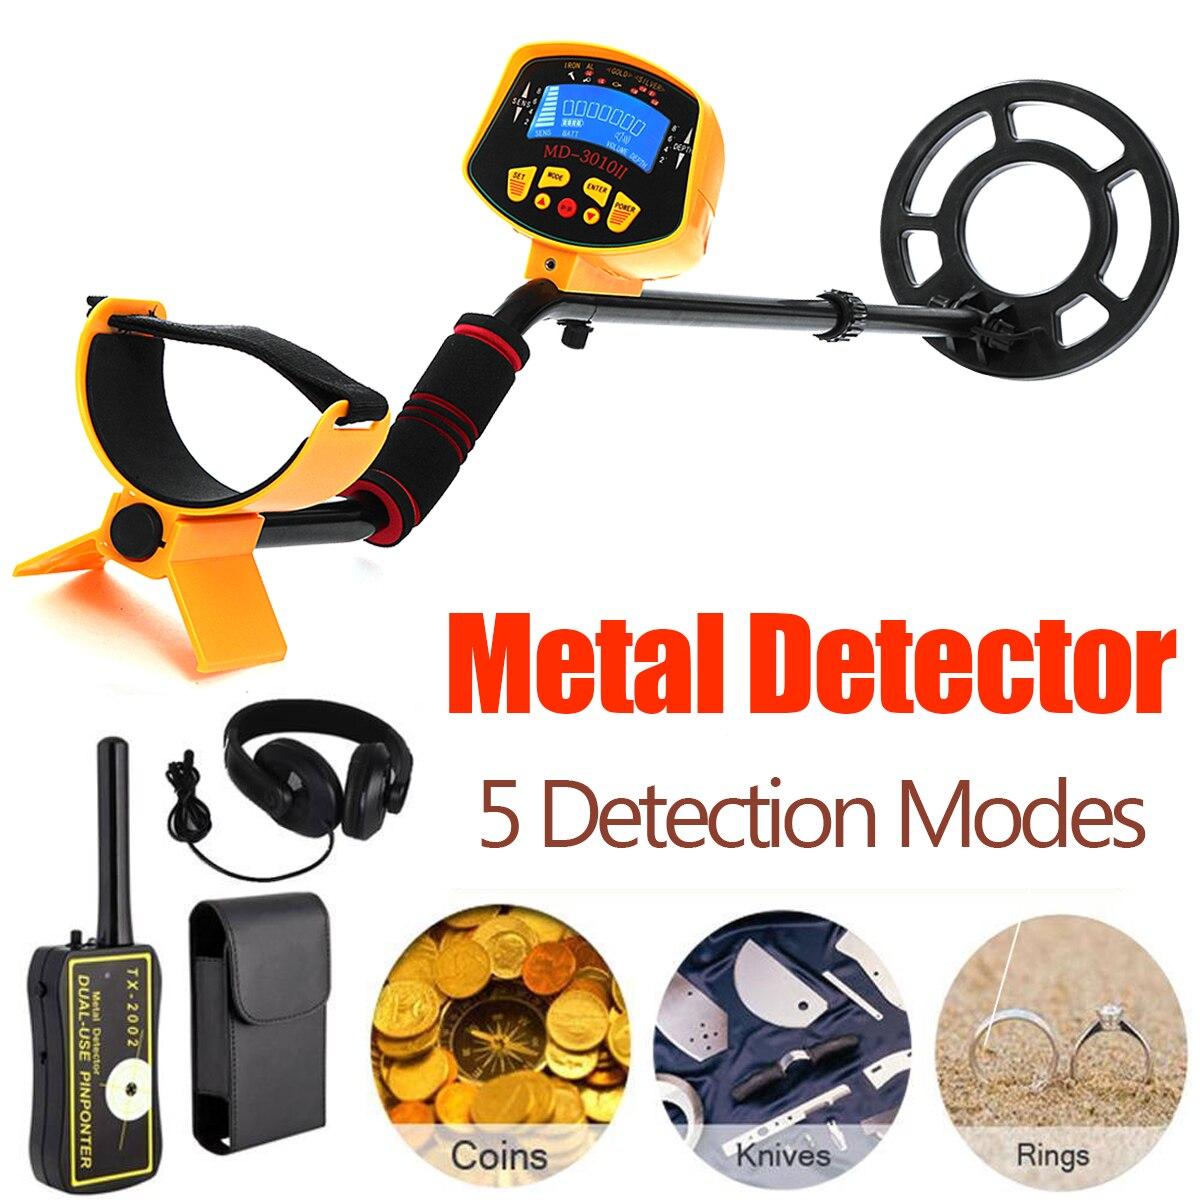 MD3010II TX 2002 Pinpointer Metal Detector Searching Gold Digger Deep Sensitive Treasure Hunter Metal Finder Seeking